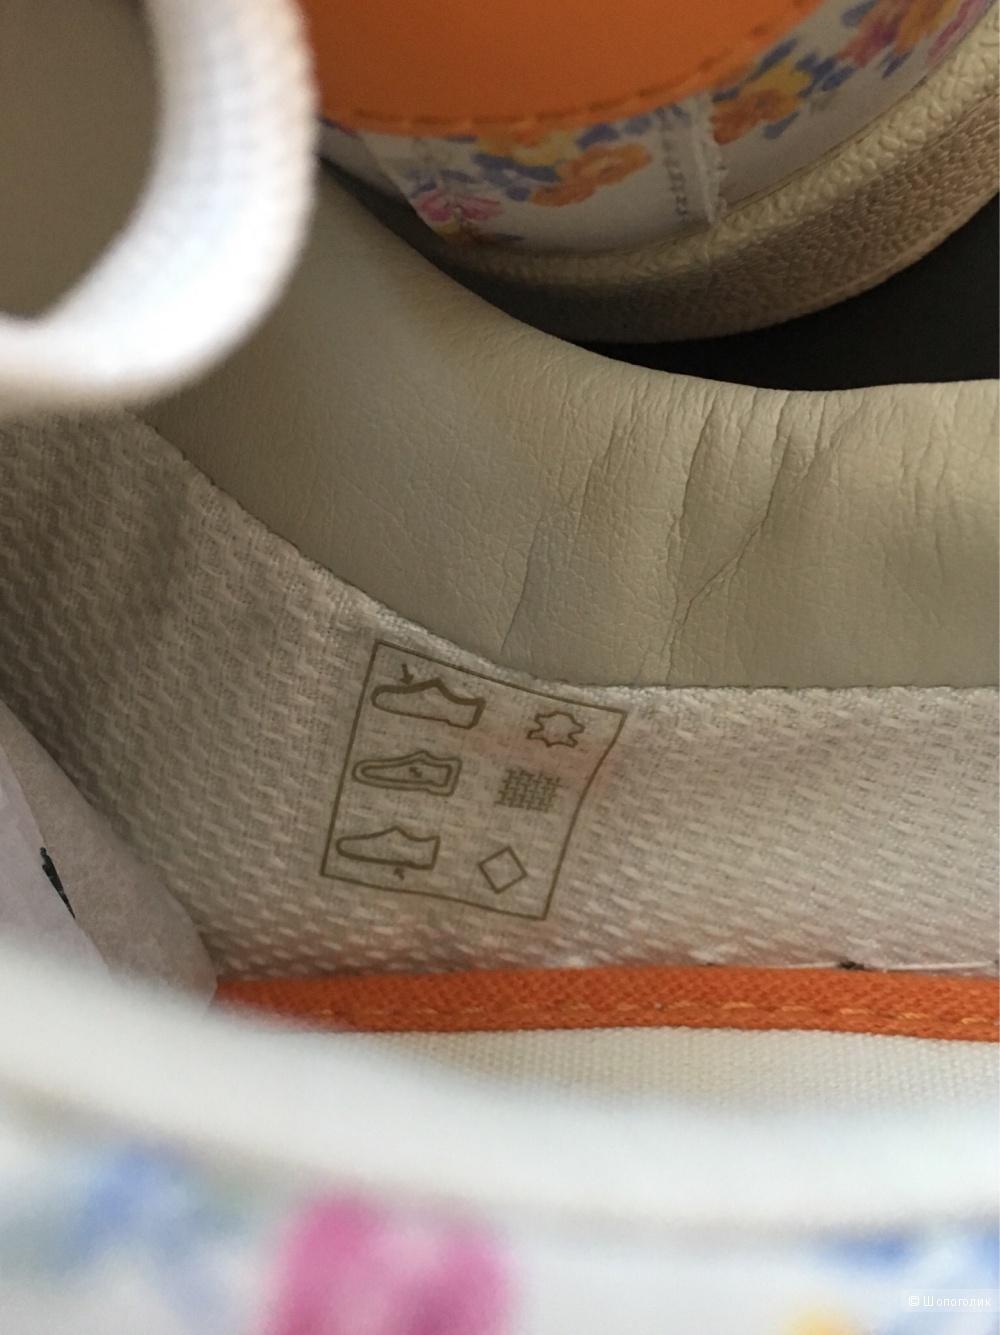 Кеды Pepe Jeans размер 39